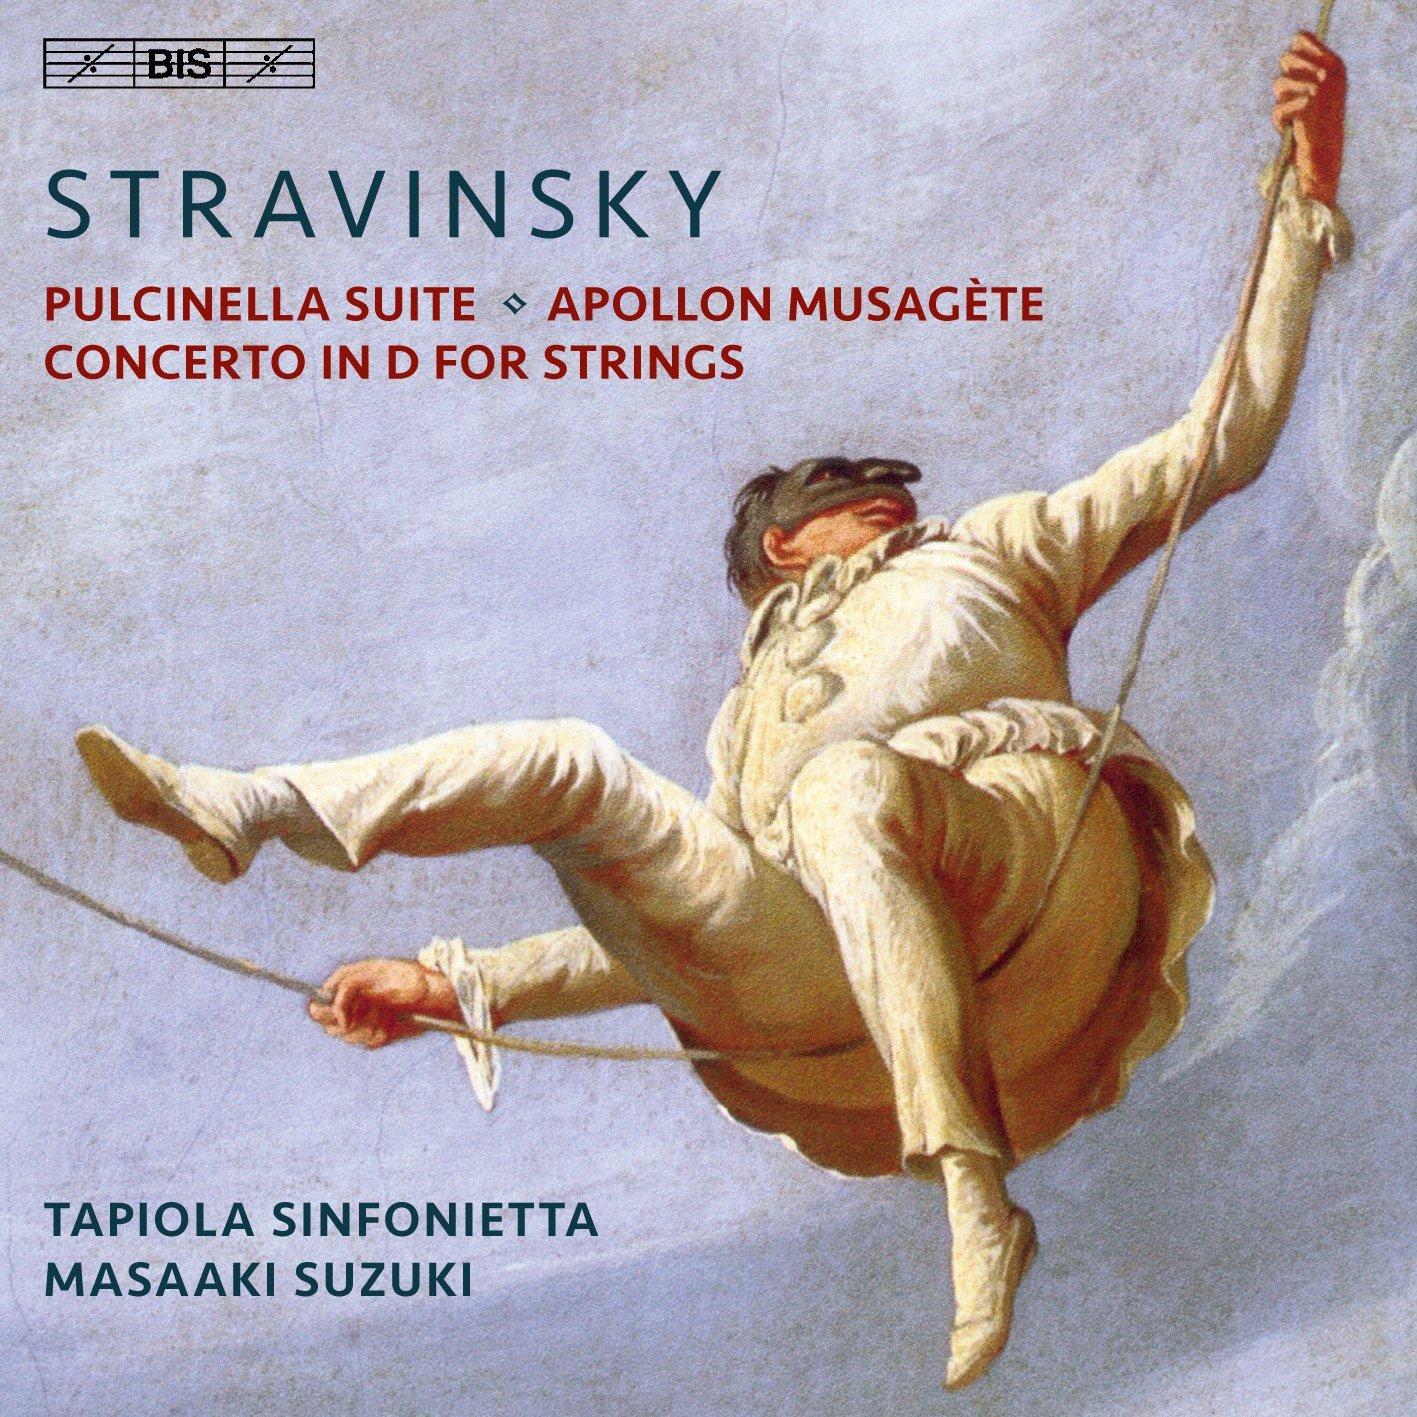 STRAVINSKY,I / SUZUKI,MASAAKI